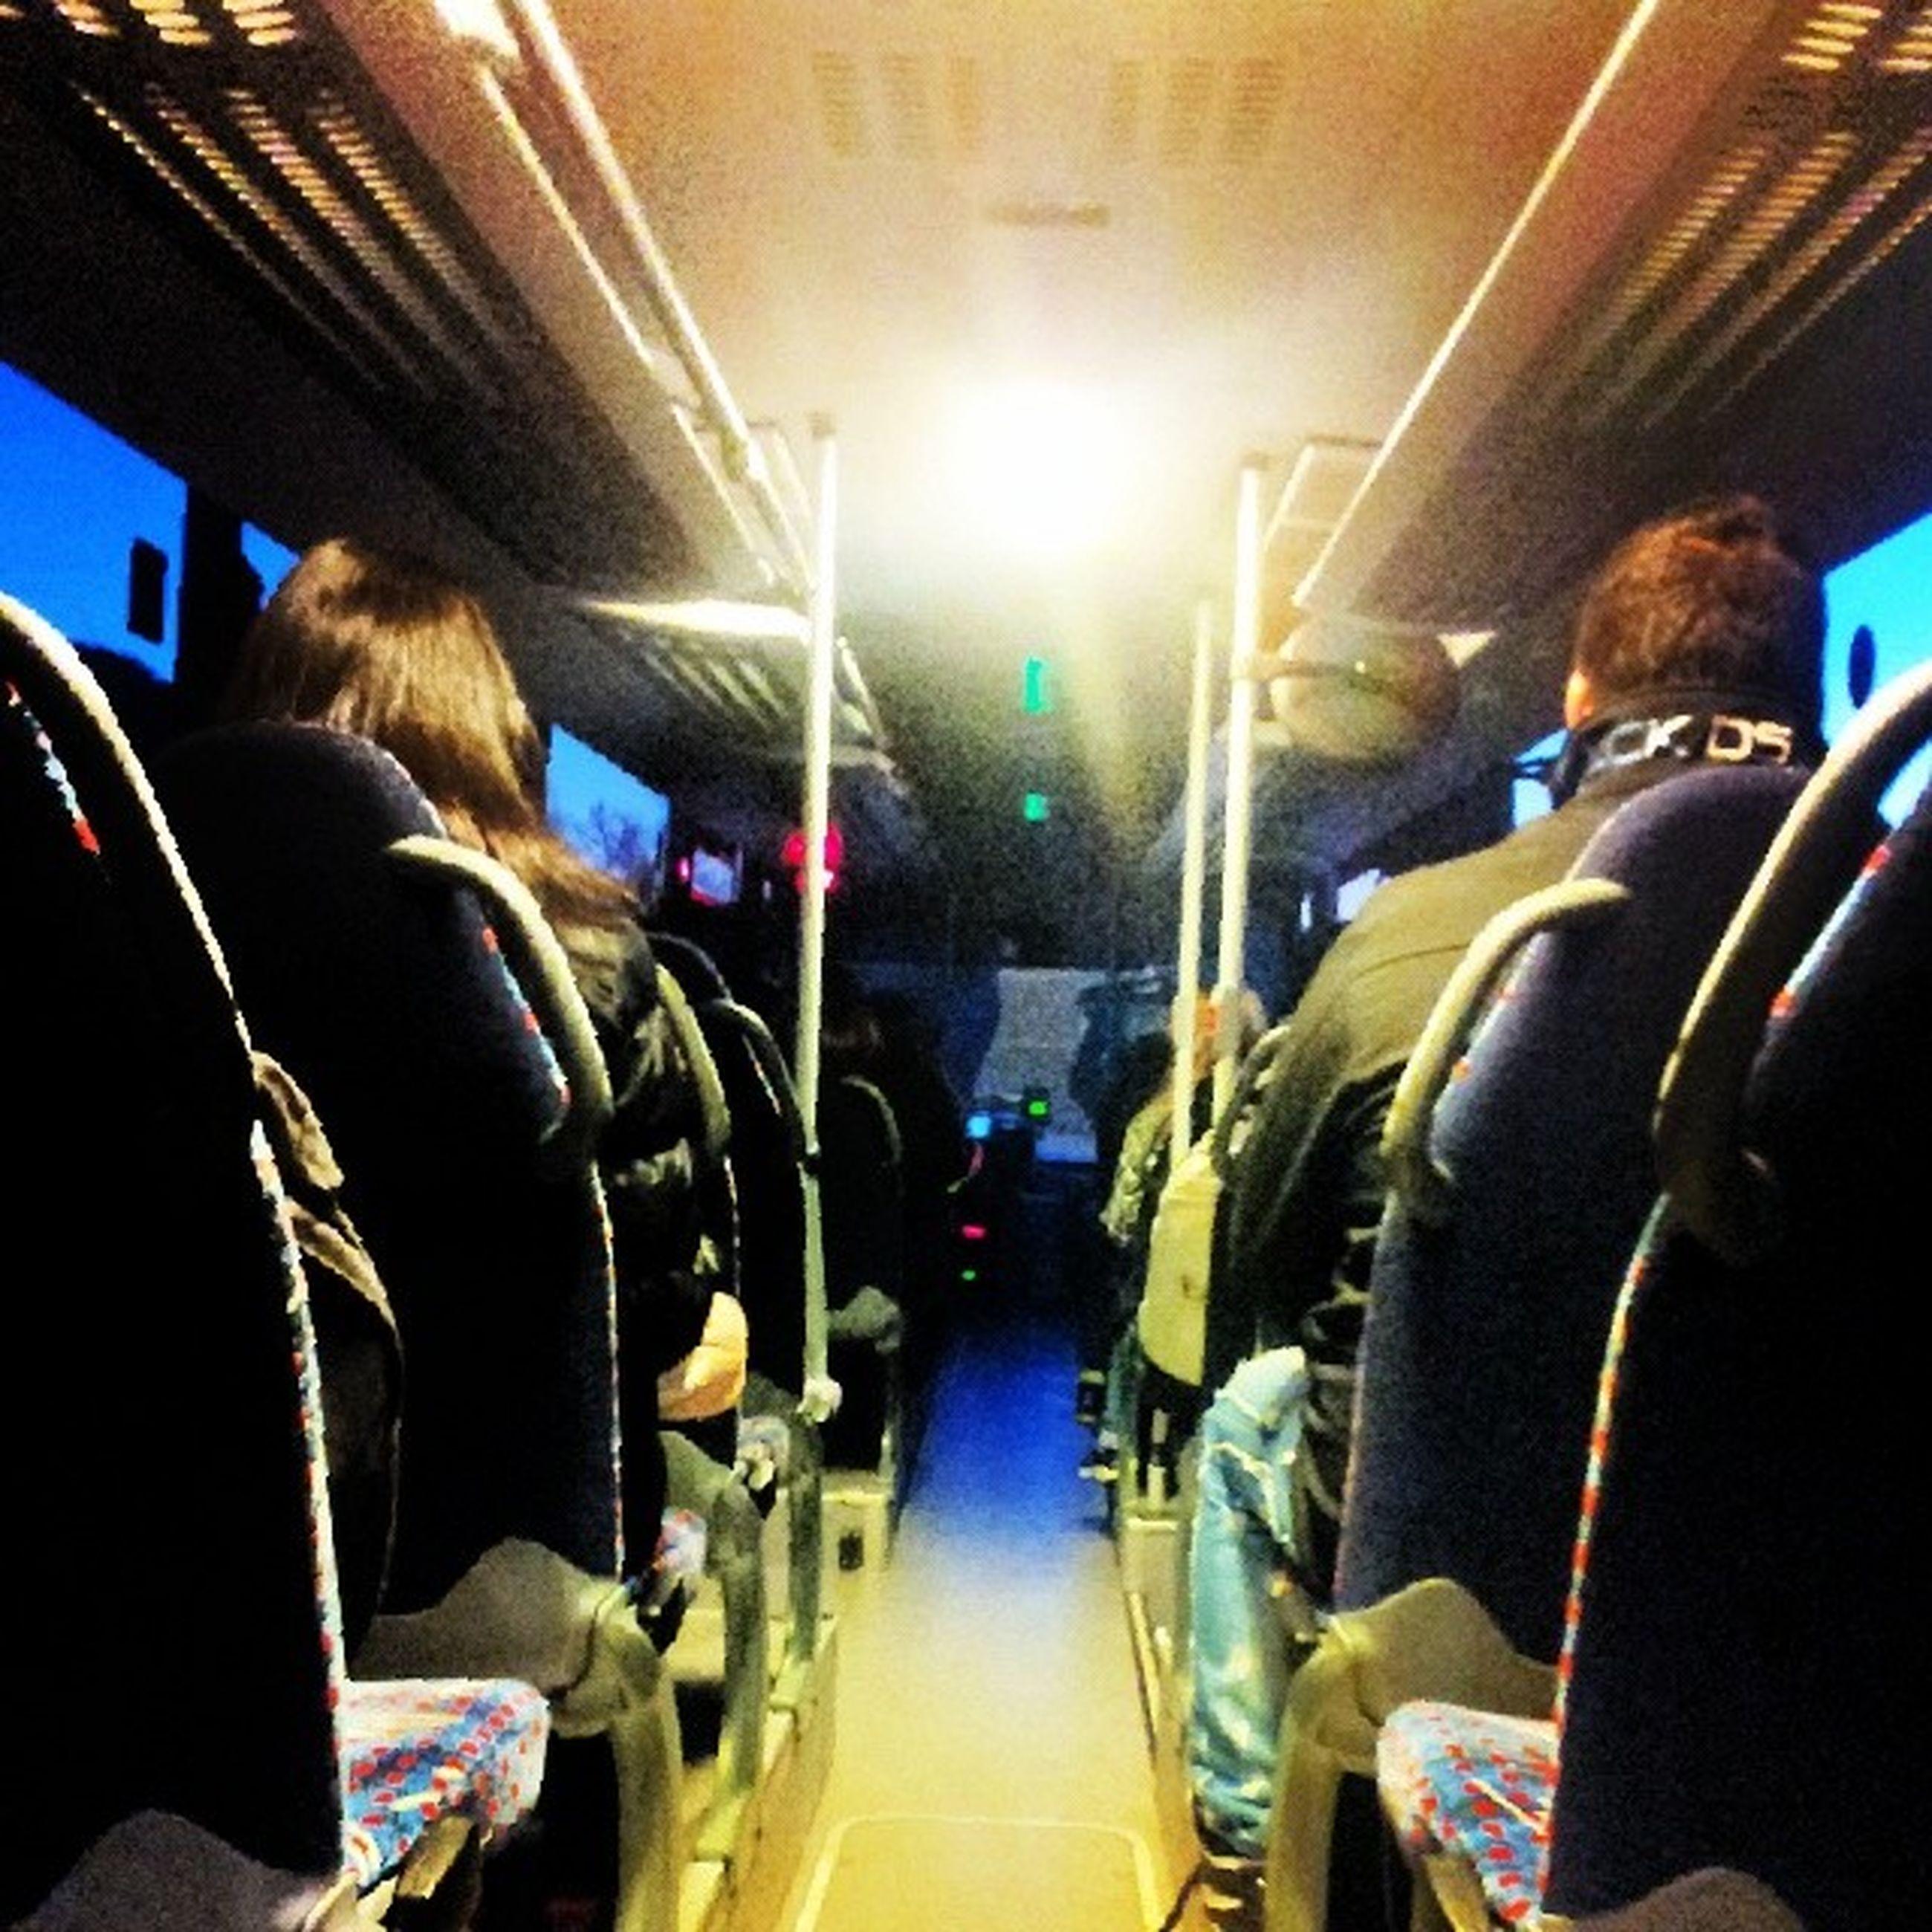 lifestyles, men, indoors, transportation, leisure activity, person, large group of people, mode of transport, vehicle interior, medium group of people, travel, rear view, passenger, togetherness, sitting, illuminated, land vehicle, public transportation, journey